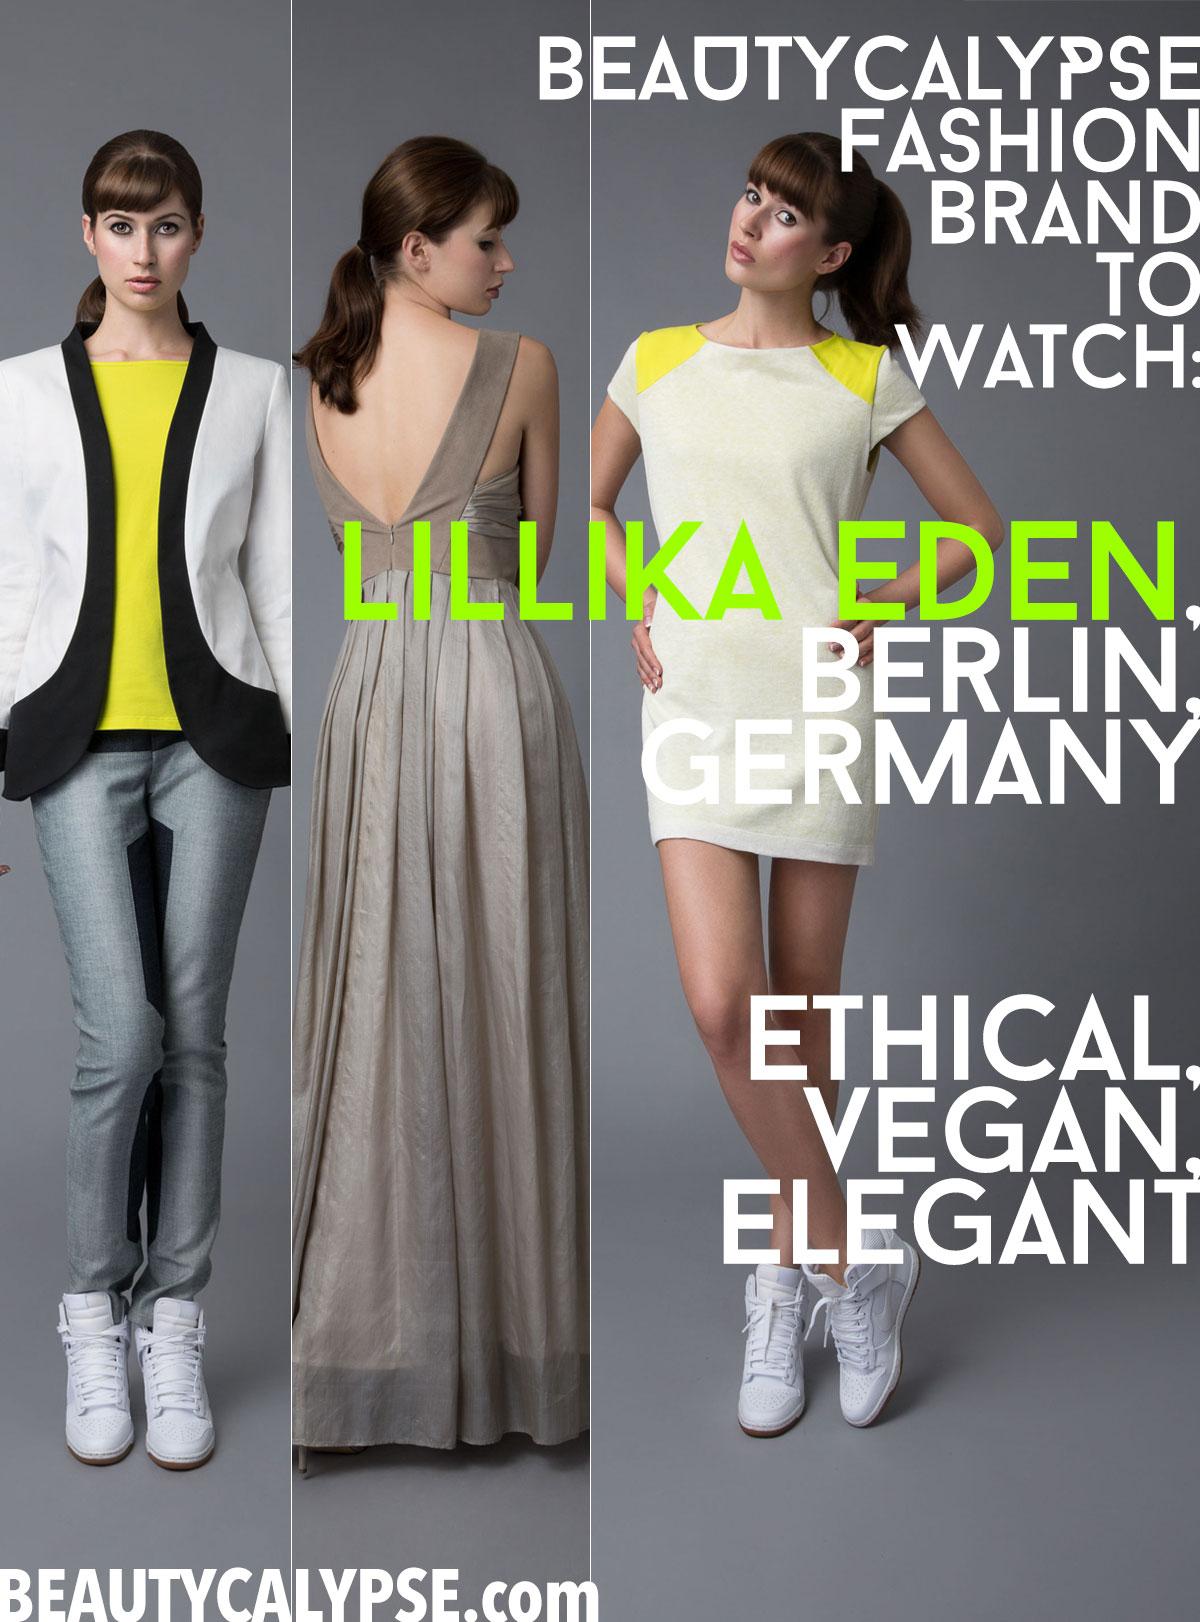 beautycalypse-brand-to-watch-lillika-eden